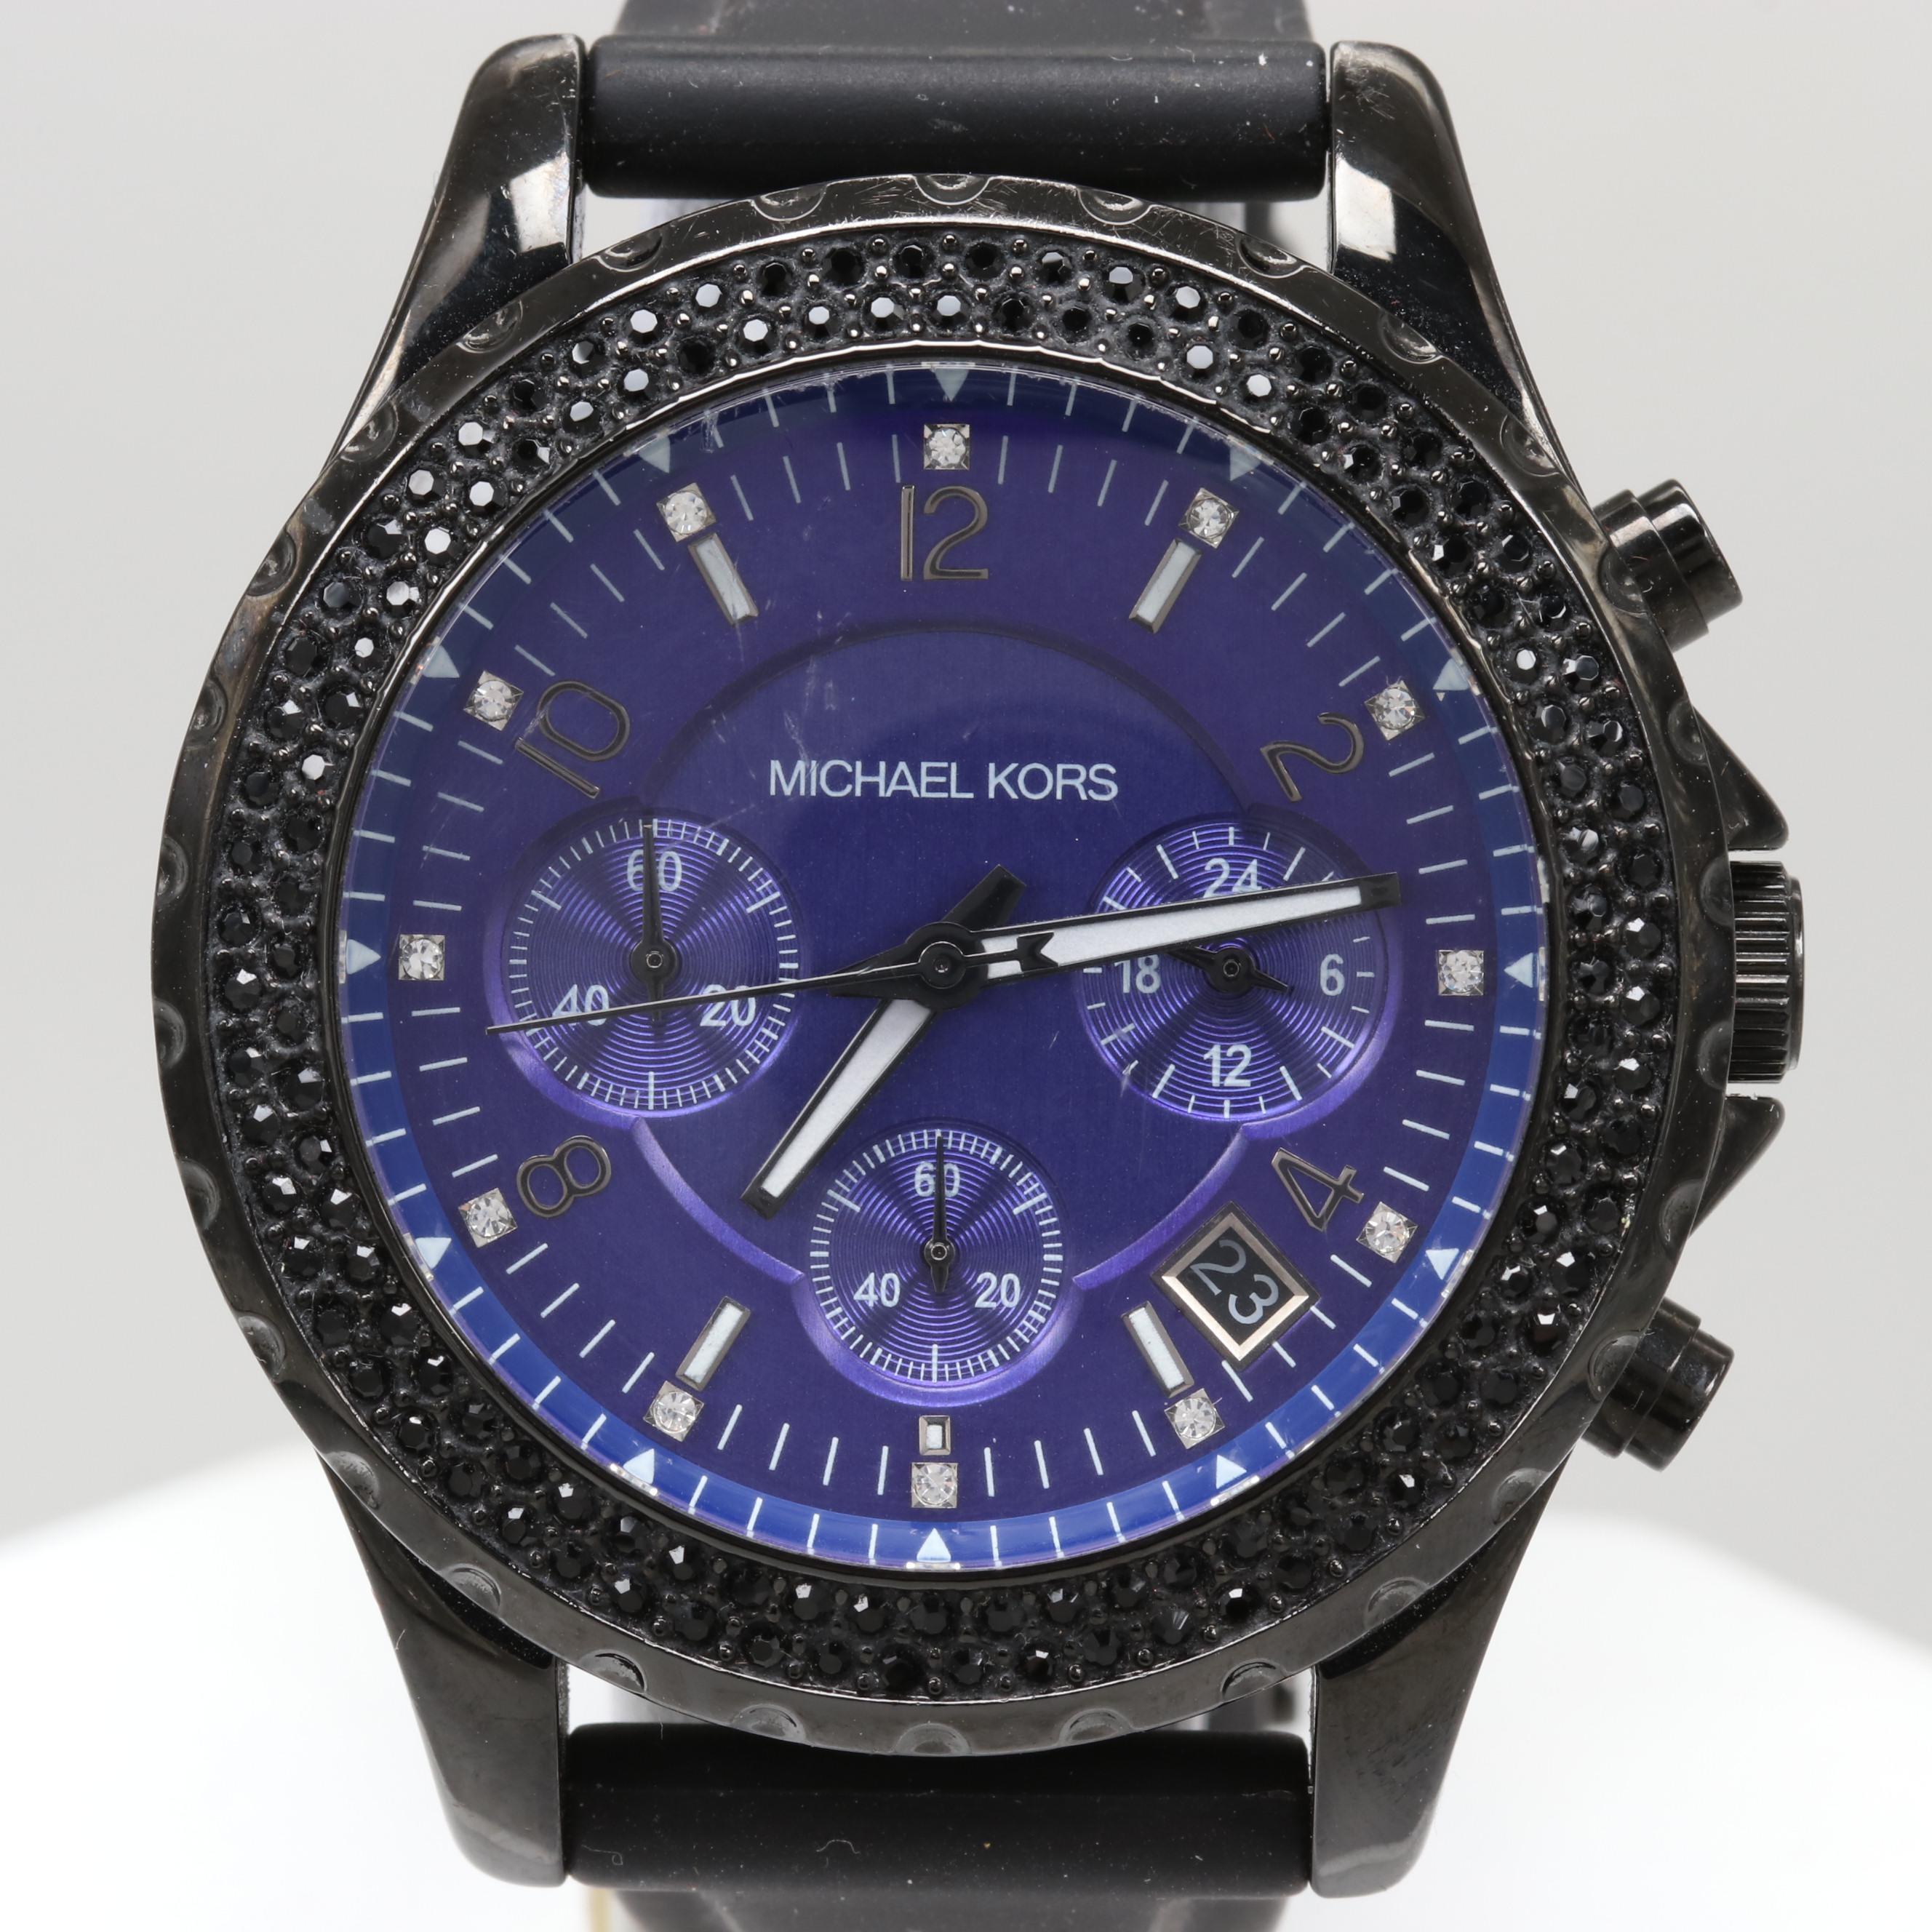 Michael Kors Quartz Chronograph Wristwatch